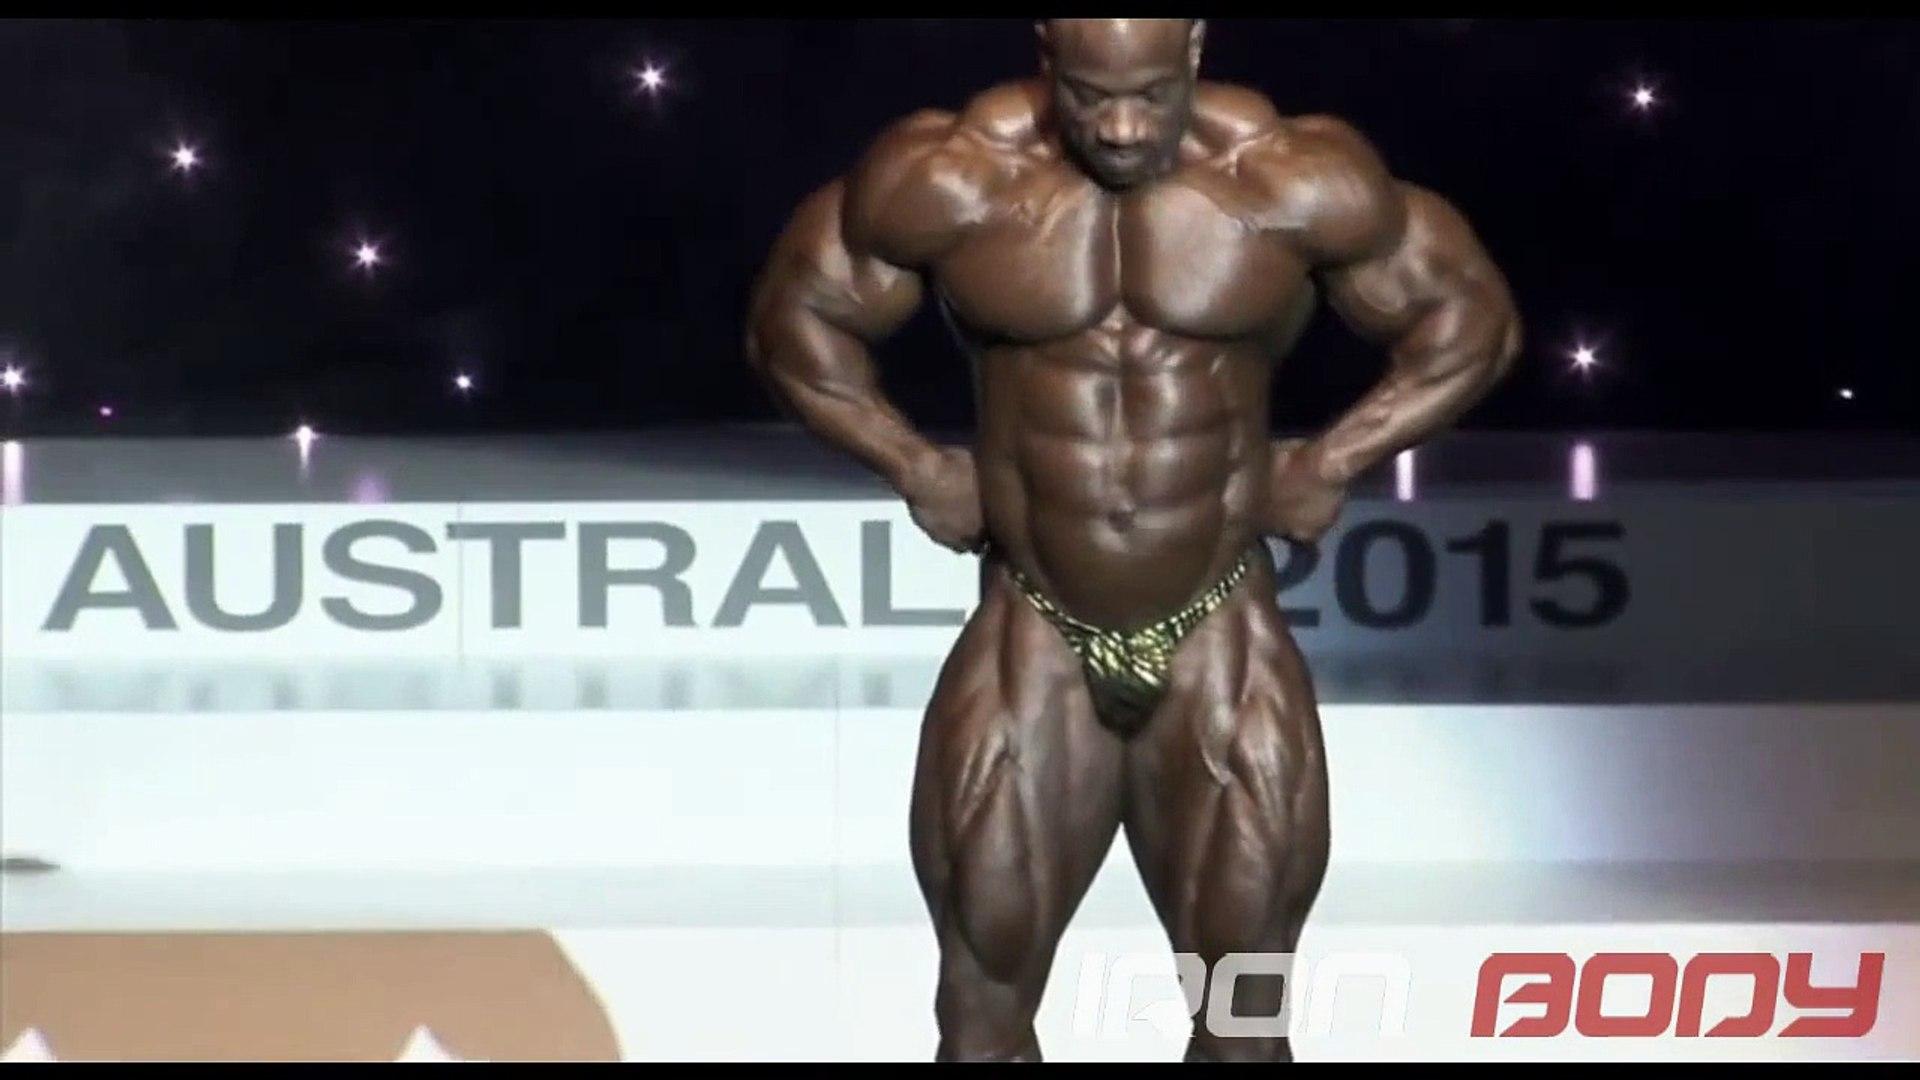 WINNER AGAIN-2015 Arnold Classic Australia - Dexter Jackson Posing (HD)-EVEN BETTER THAN 2008